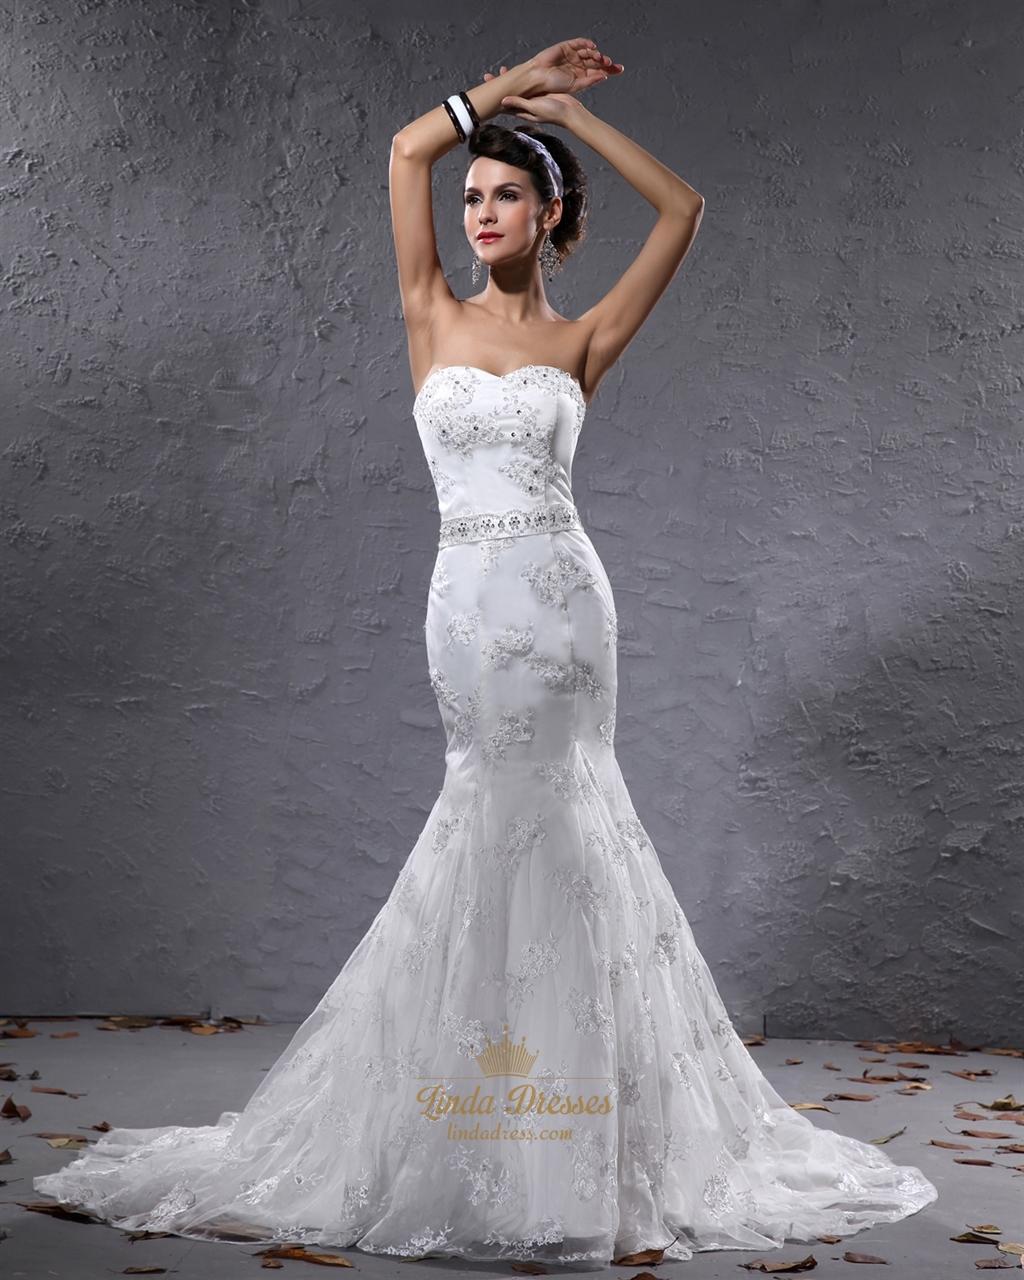 Lace Mermaid Wedding Dress: Ivory Mermaid Sweetheart Lace Wedding Dresses With Beaded